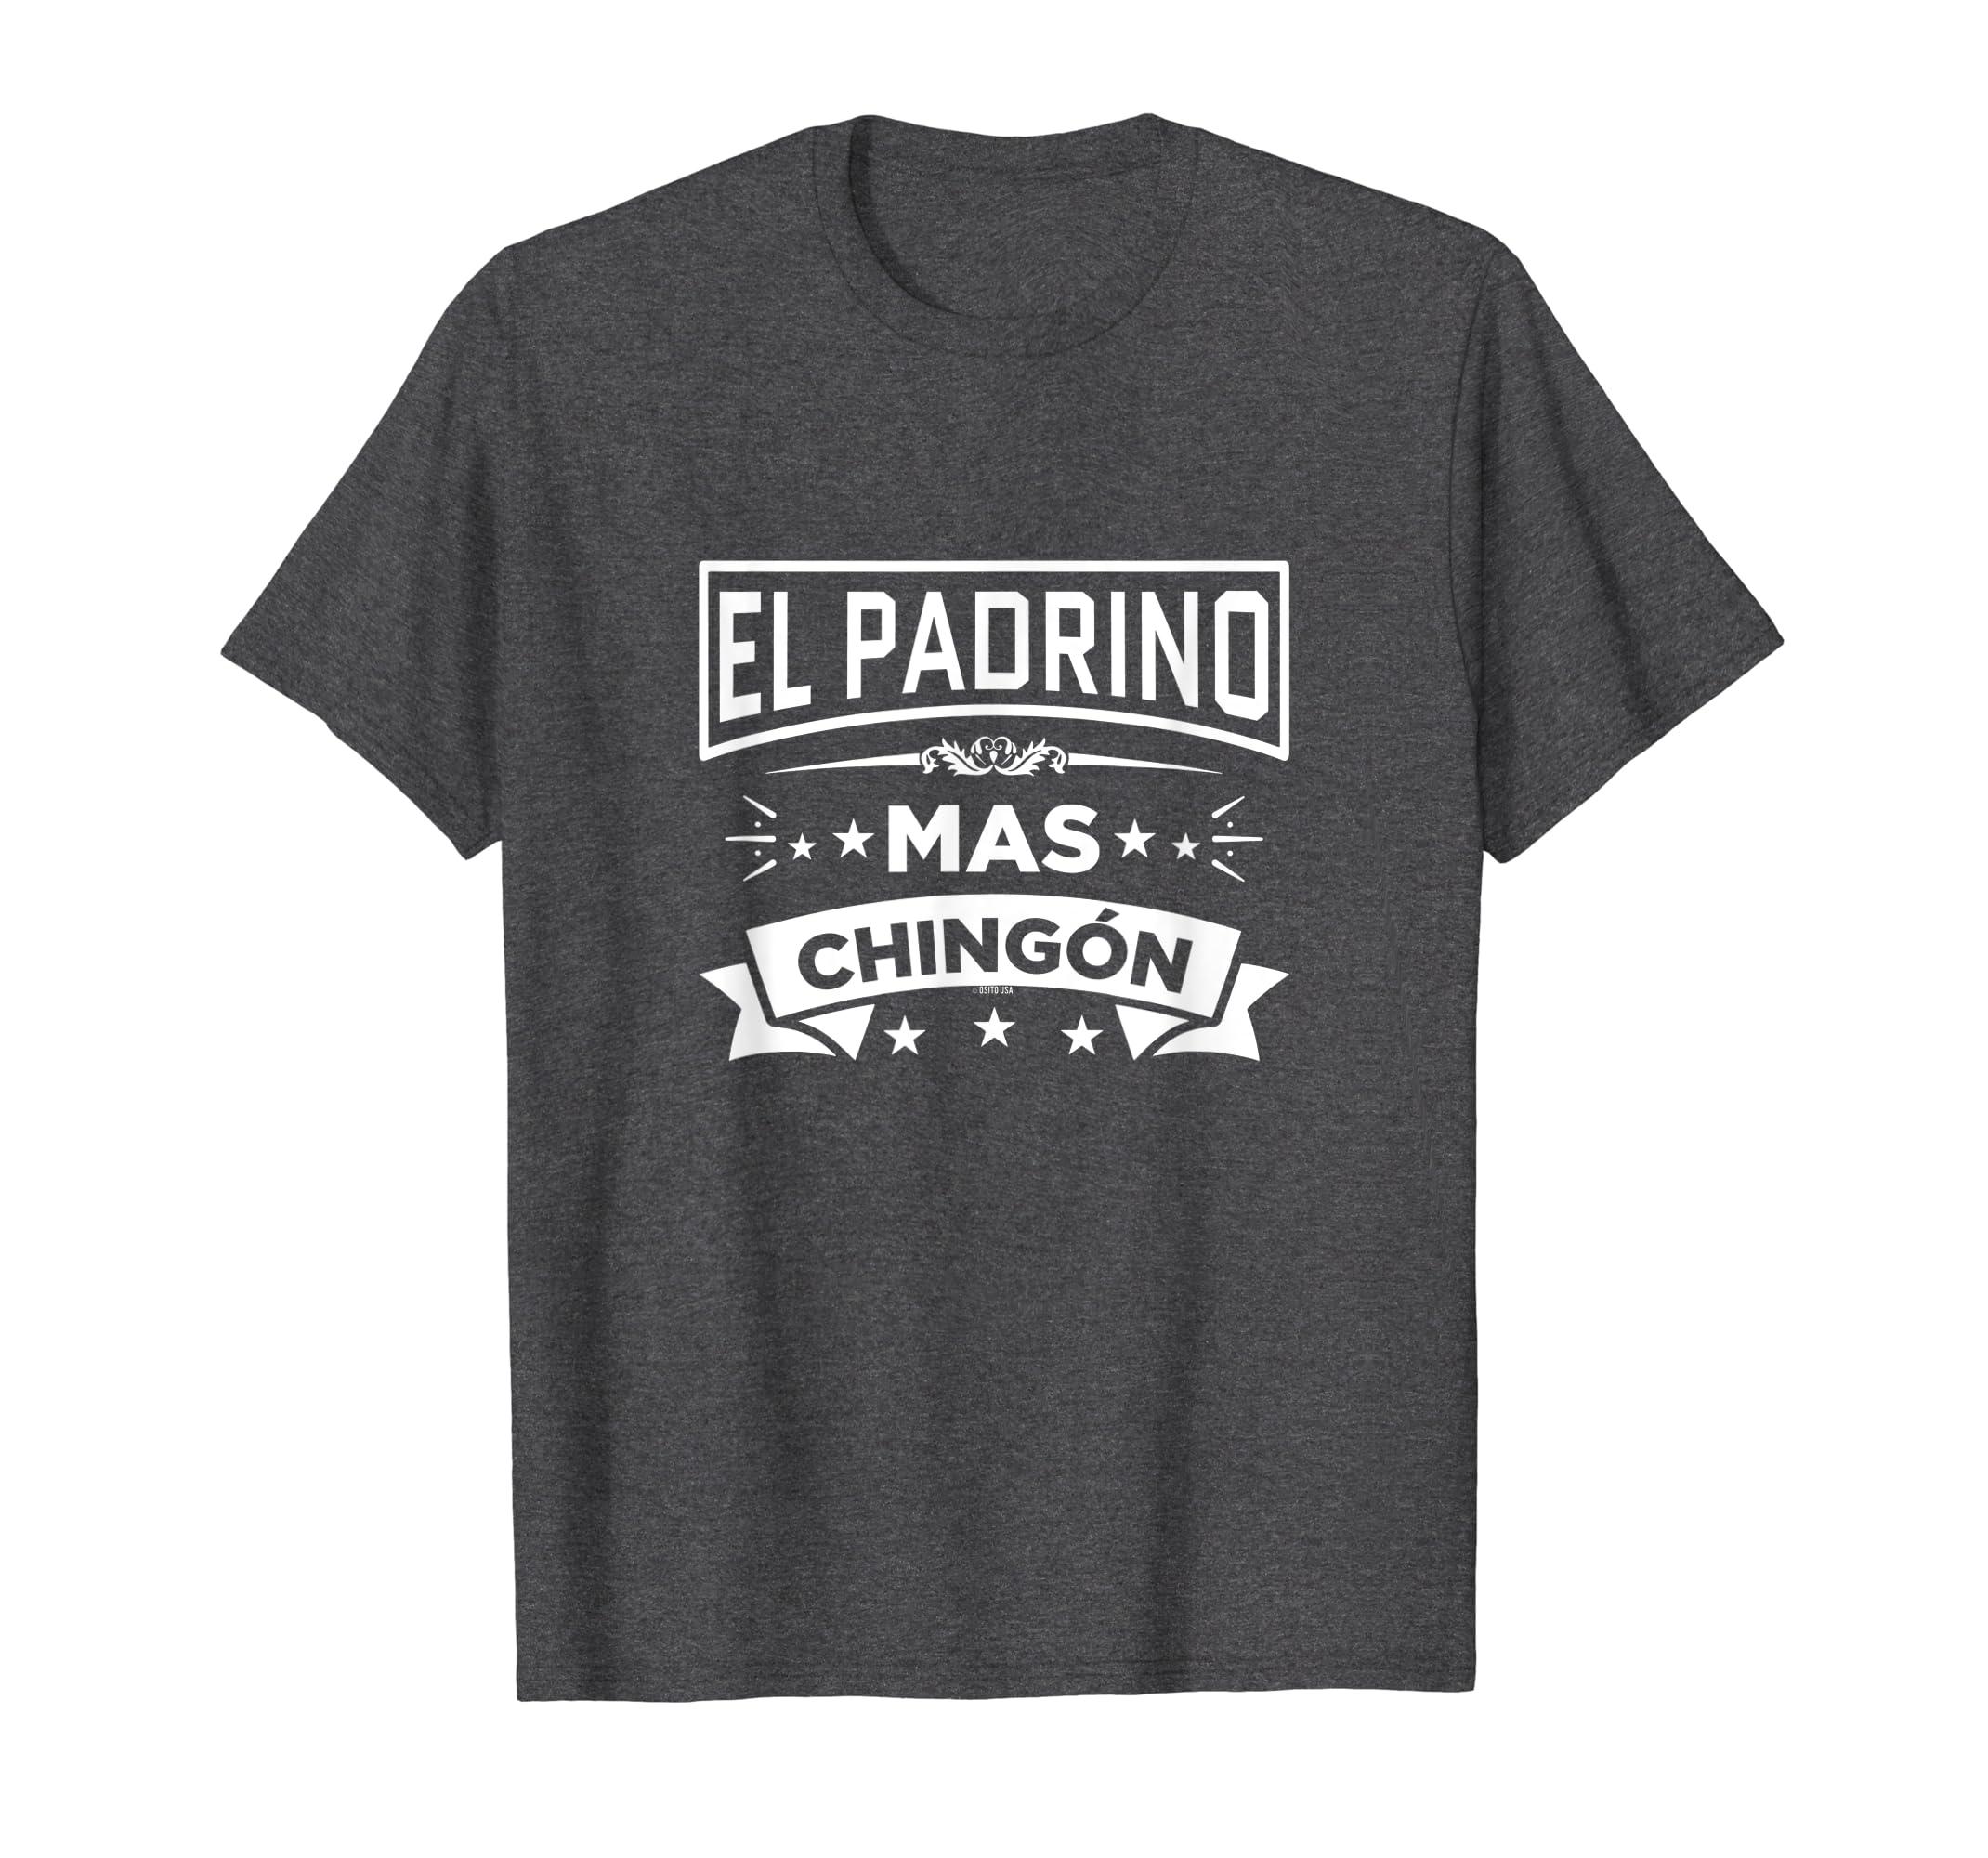 El Padrino Mas Chingon Funny Spanish Fathers Day Gift Shirt-Teehay